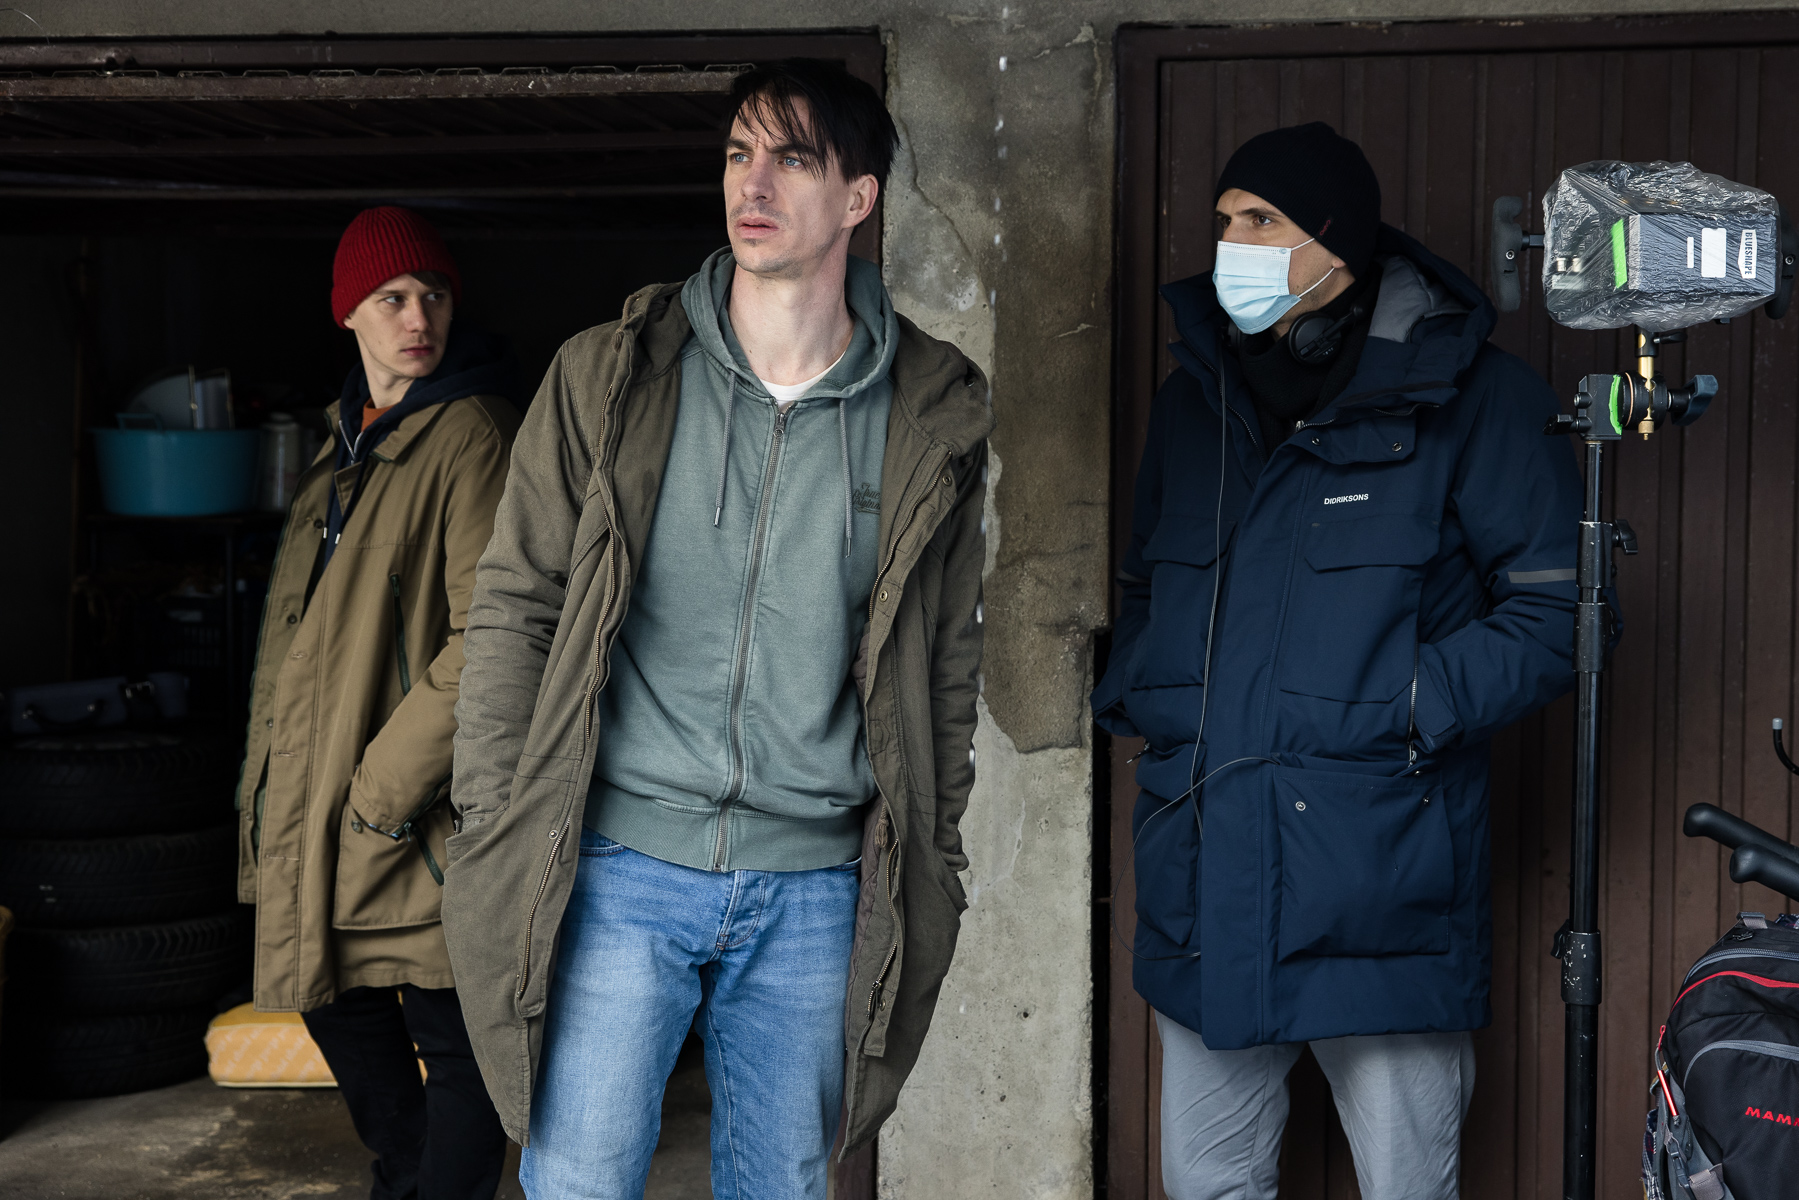 Actors Timon Šturbej and Jure Henigman with director Marko Šantić on the set of Wake Me.